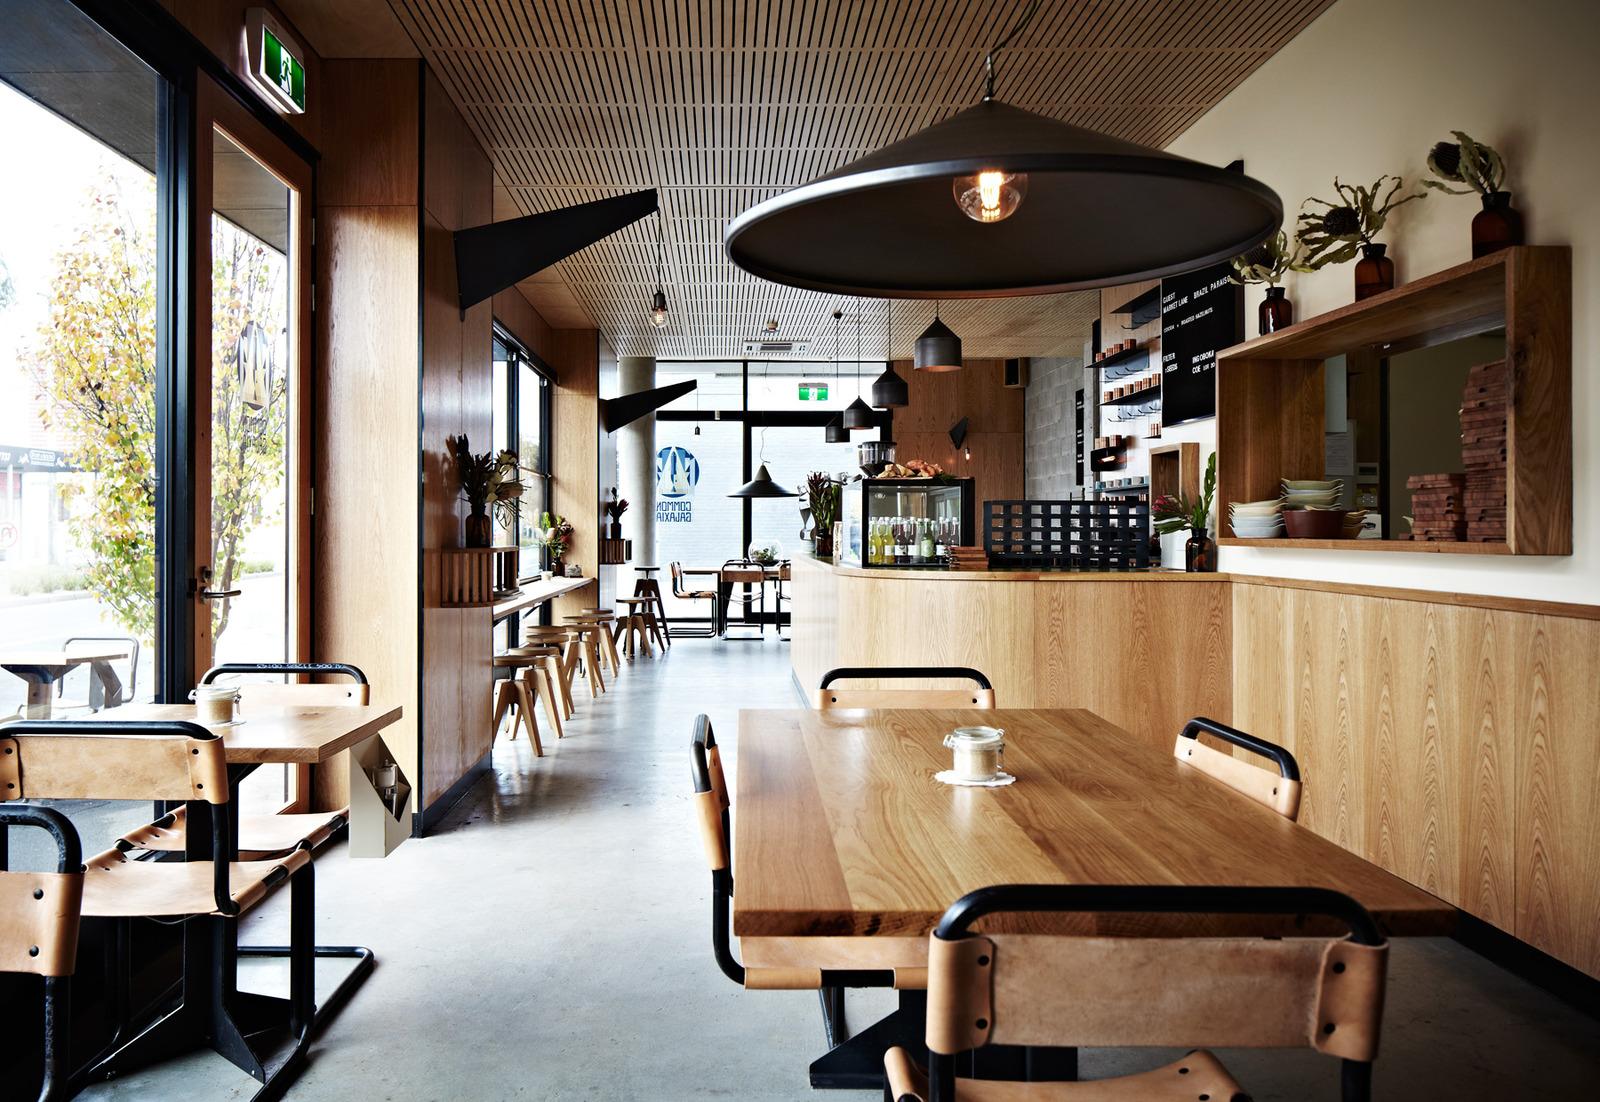 Common Galaxia Coffee bar in Australia - Jelanie 1